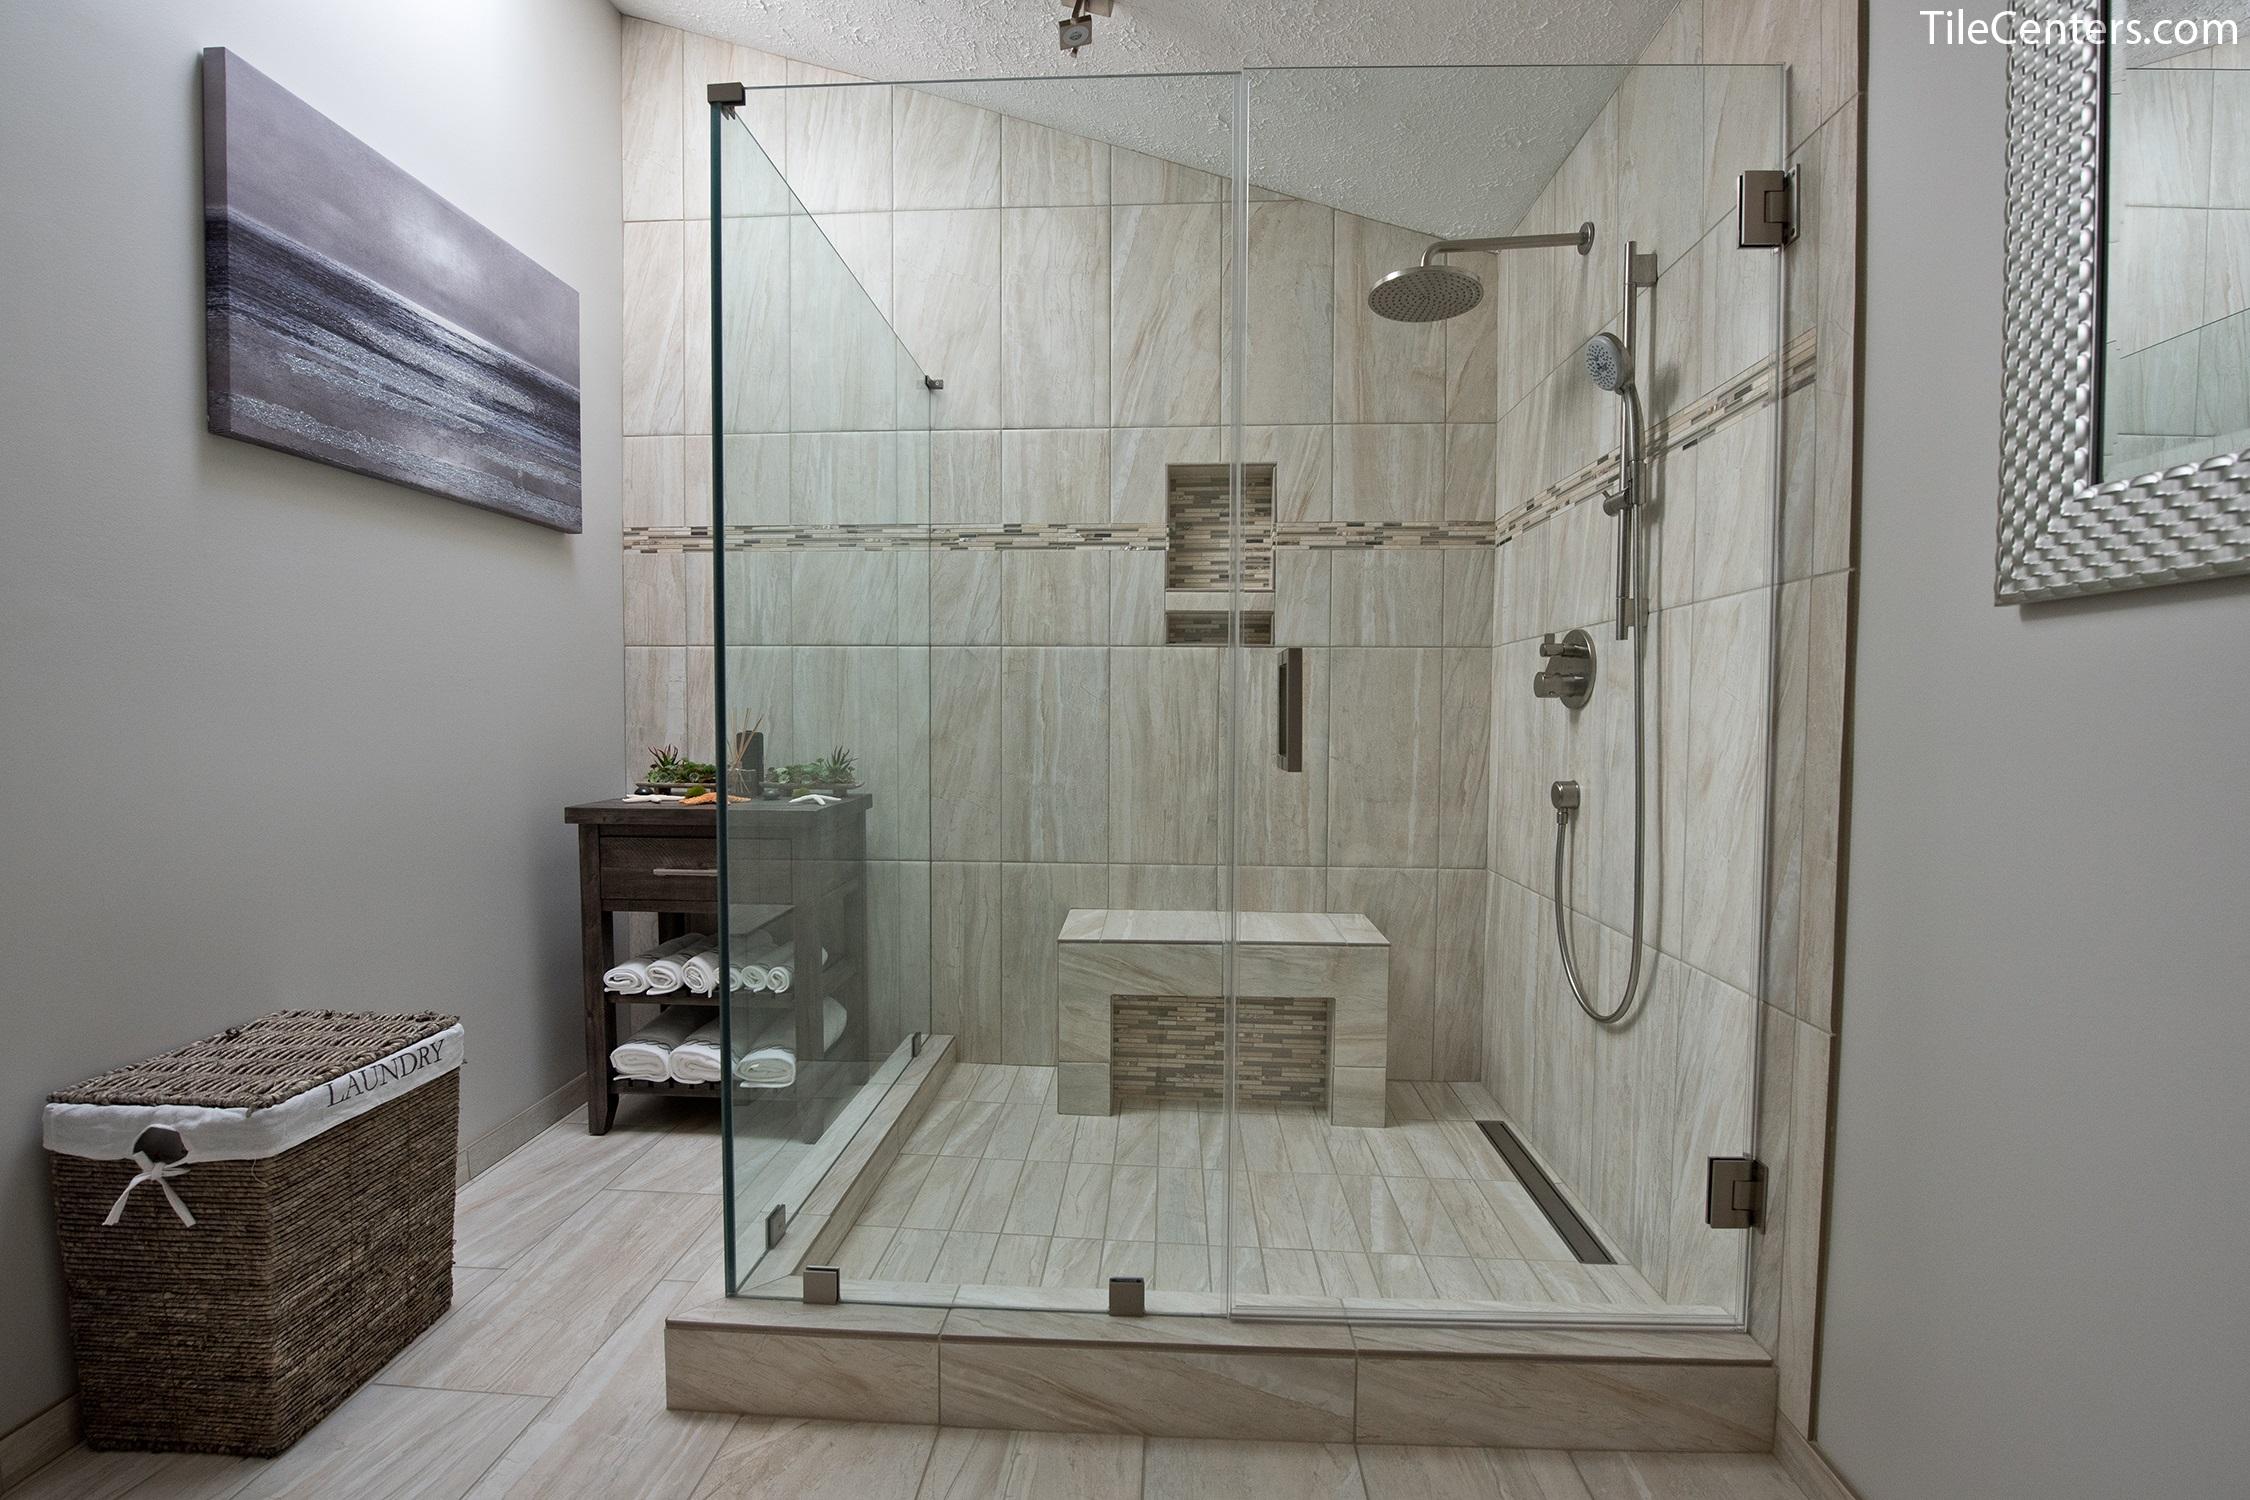 Bathroom Whitestone Rd Silver Spring MD Tile Center - Bathroom remodeling silver spring md